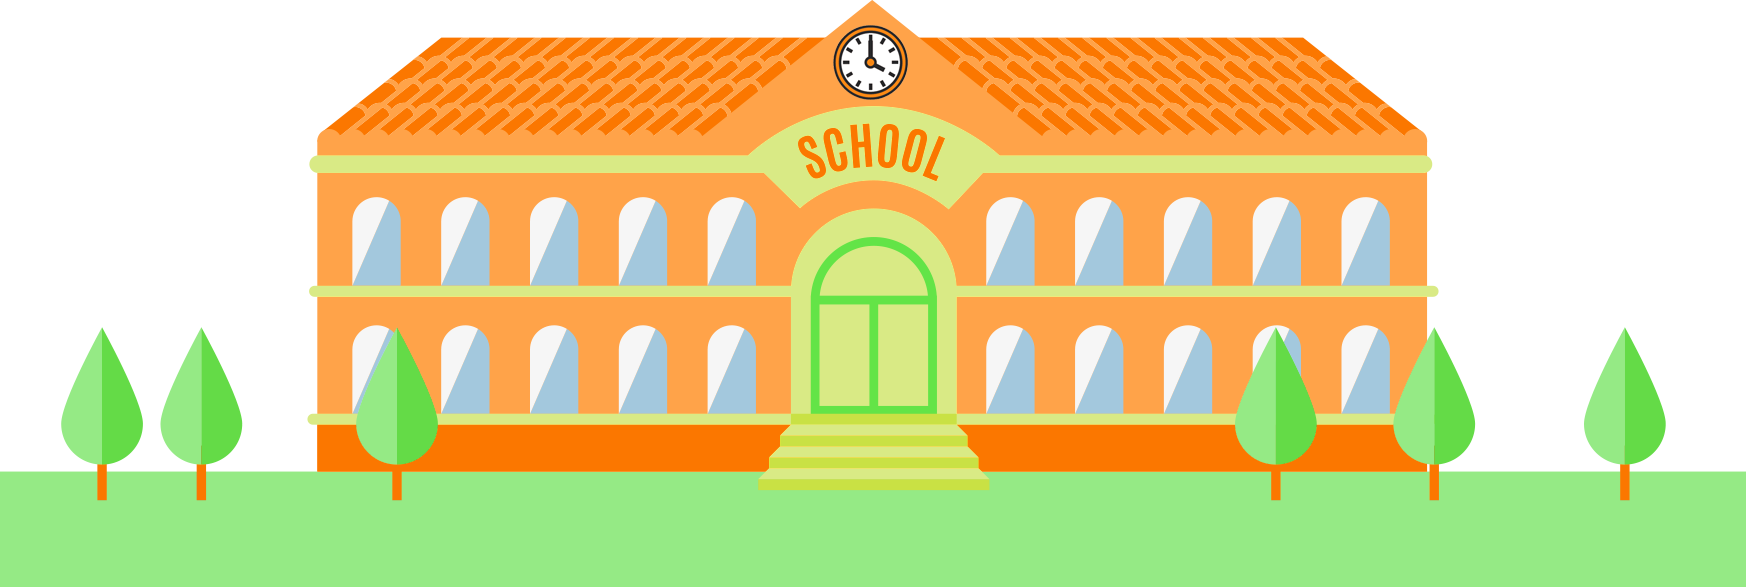 School windows clipart picture transparent library Ridgewood After School Program | Spirit TaeKwonDo picture transparent library